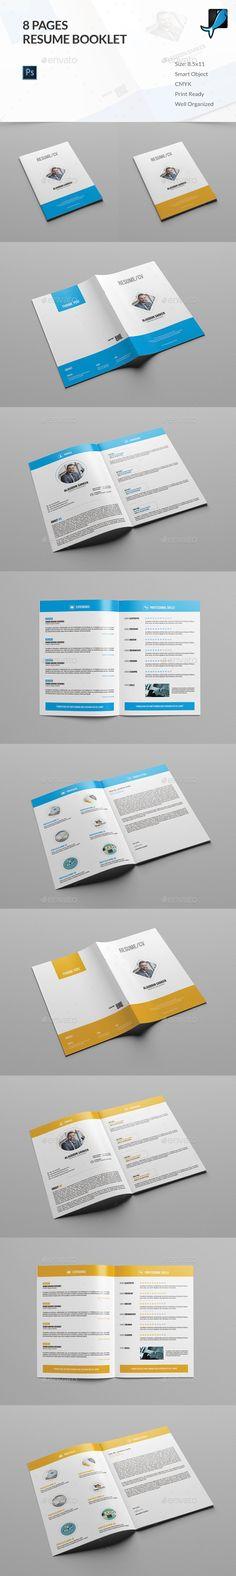 MixMaker - DJ Resume / Press kit PSD Template | Press kits, Psd ...